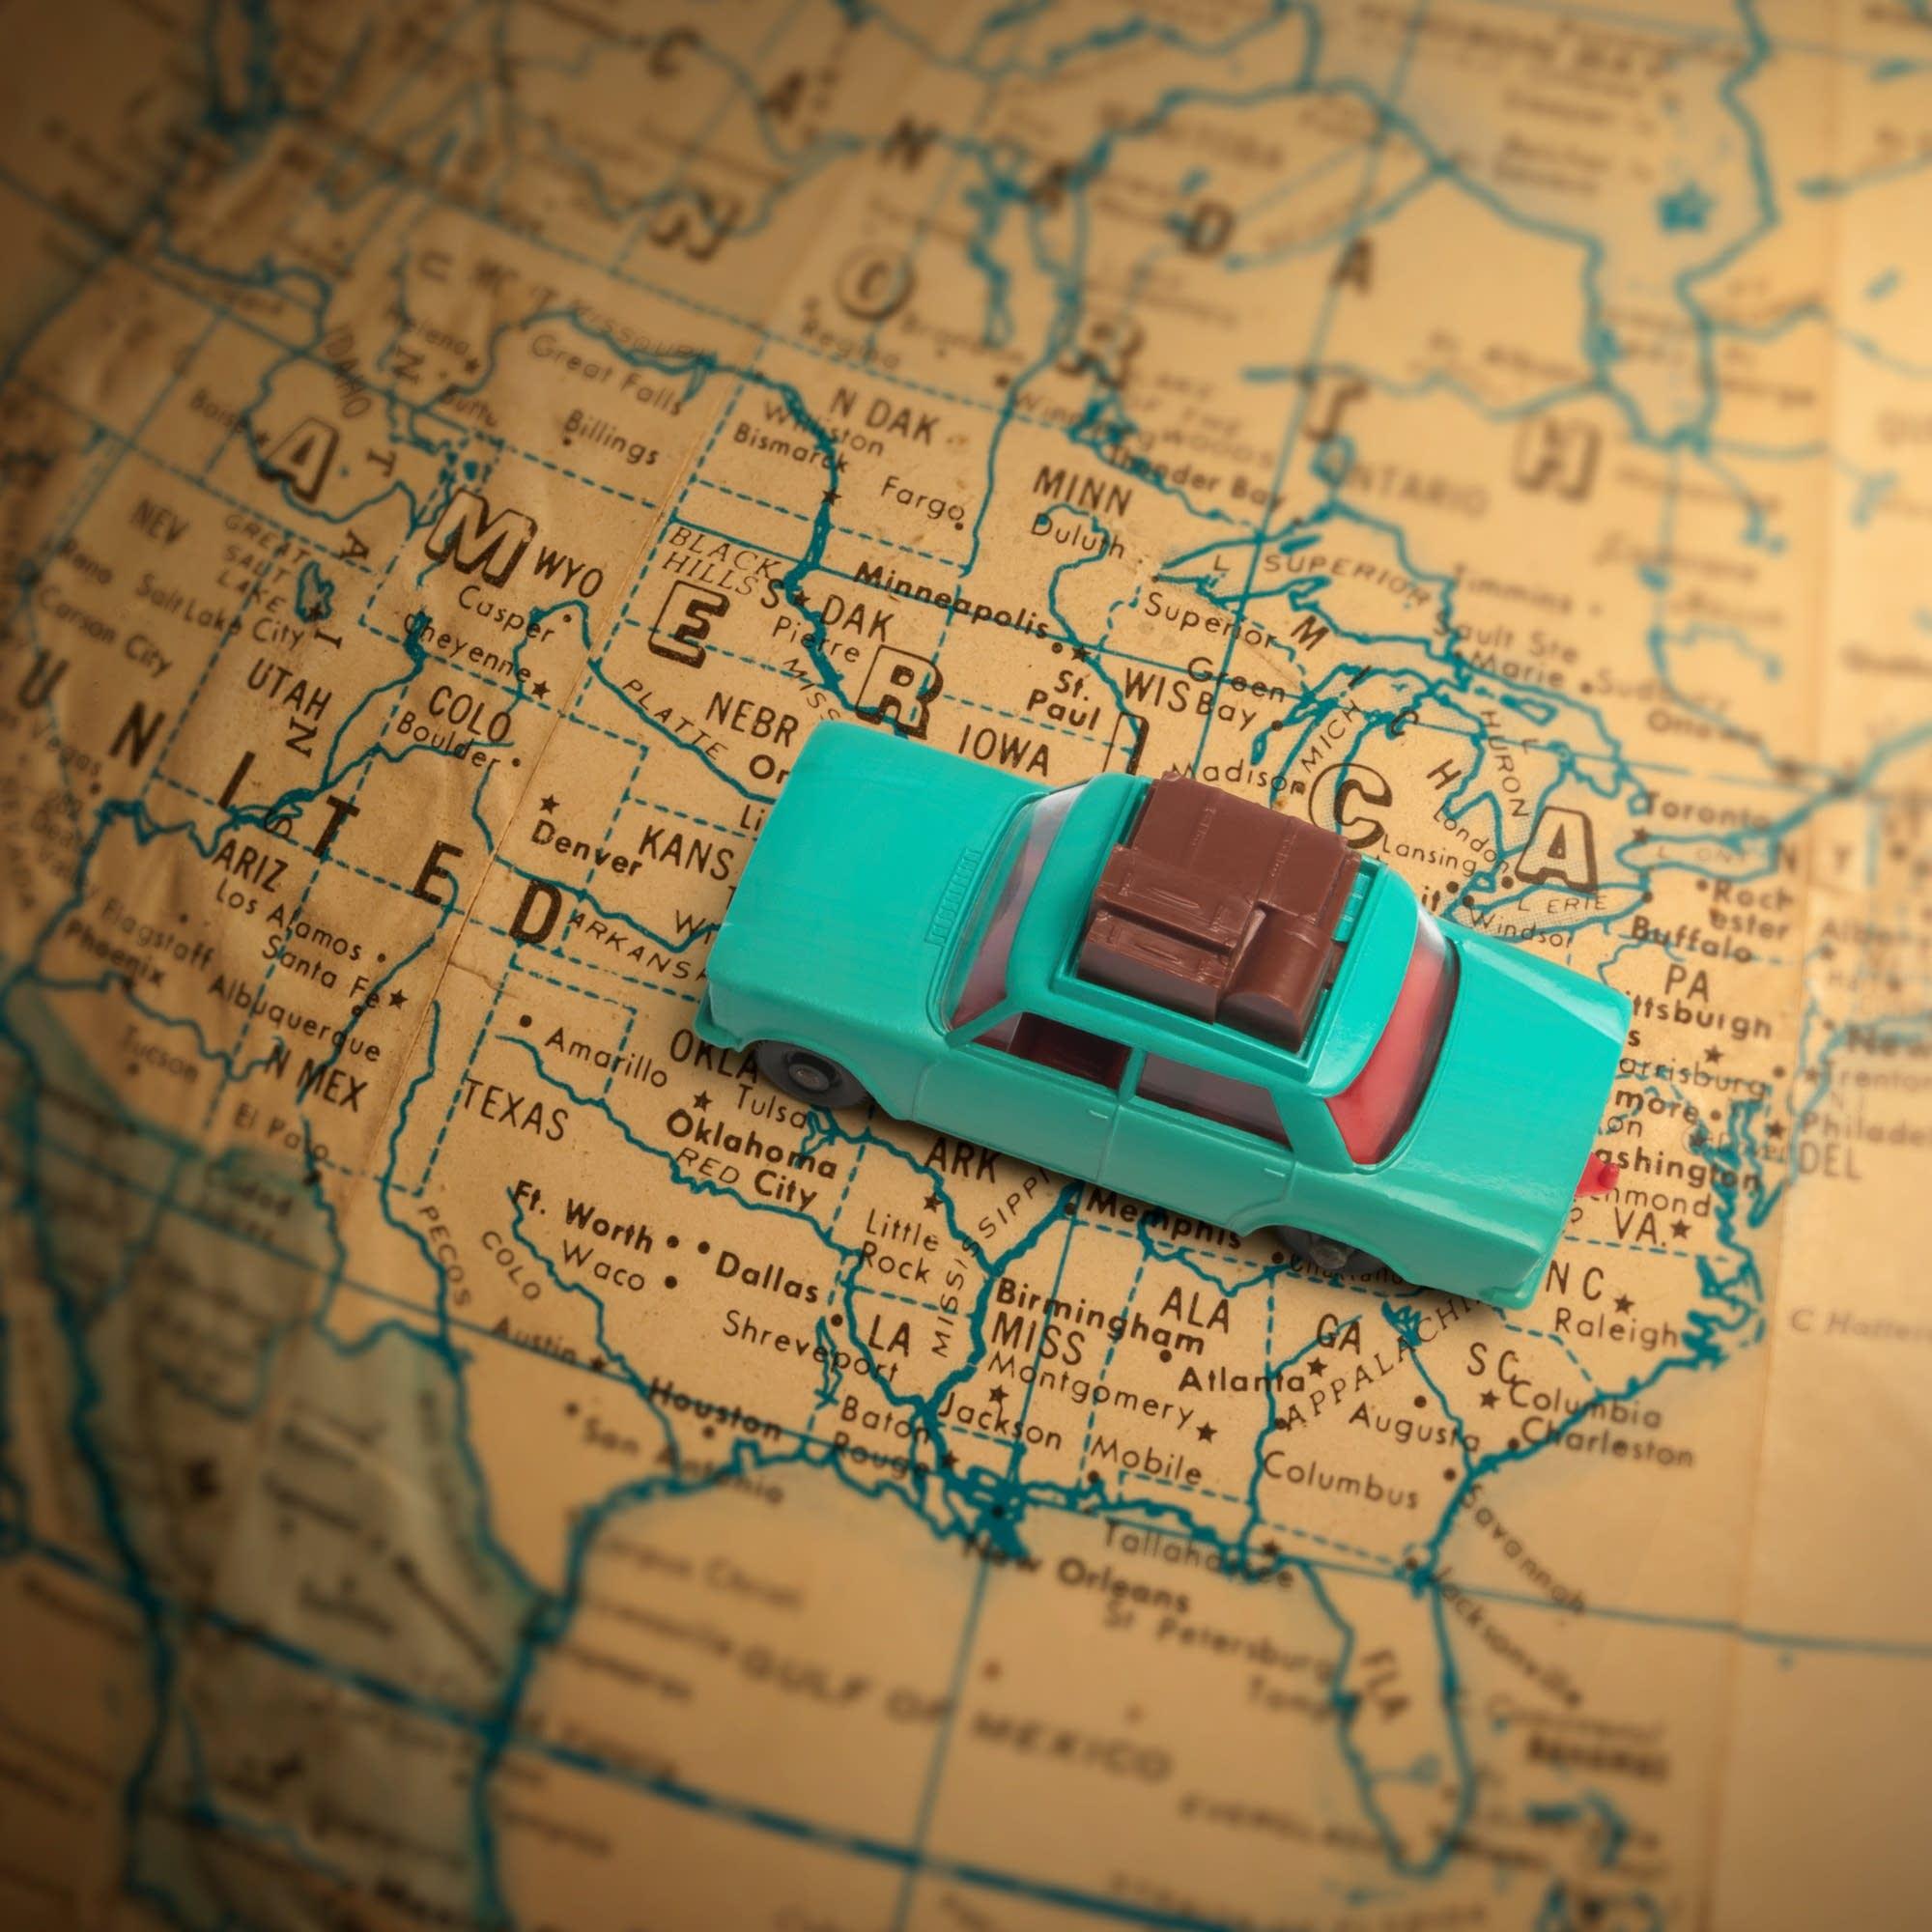 Globetrotting toy car vacation